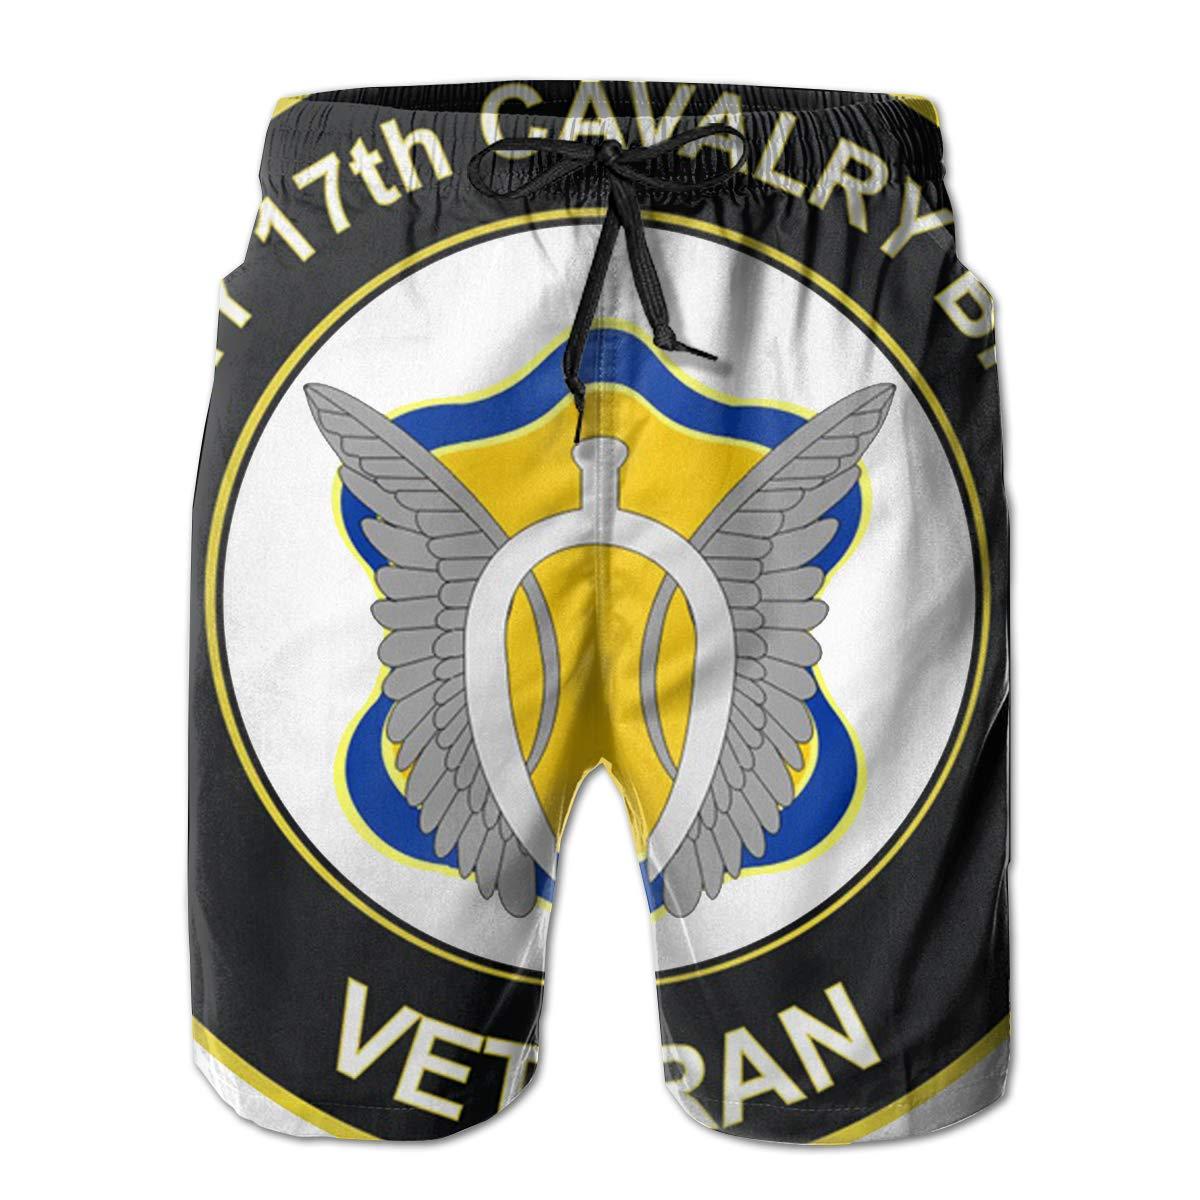 Reality And Ideals U.S Army 17th Cavalry Brigade Veteran Mens Swim Trunks Board Shorts